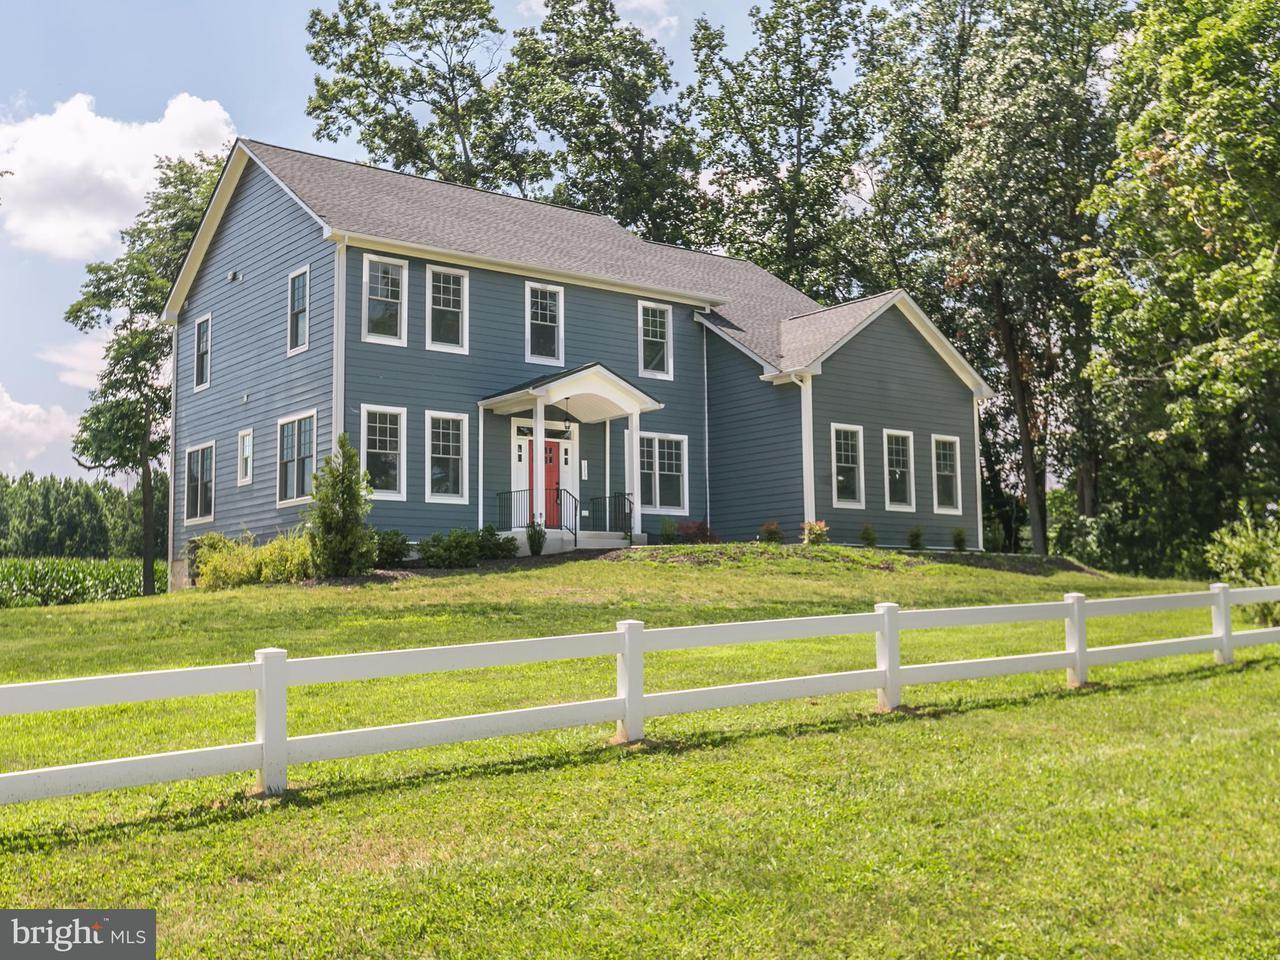 Single Family Home for Sale at 1313 MONKTON Road 1313 MONKTON Road Monkton, Maryland 21111 United States